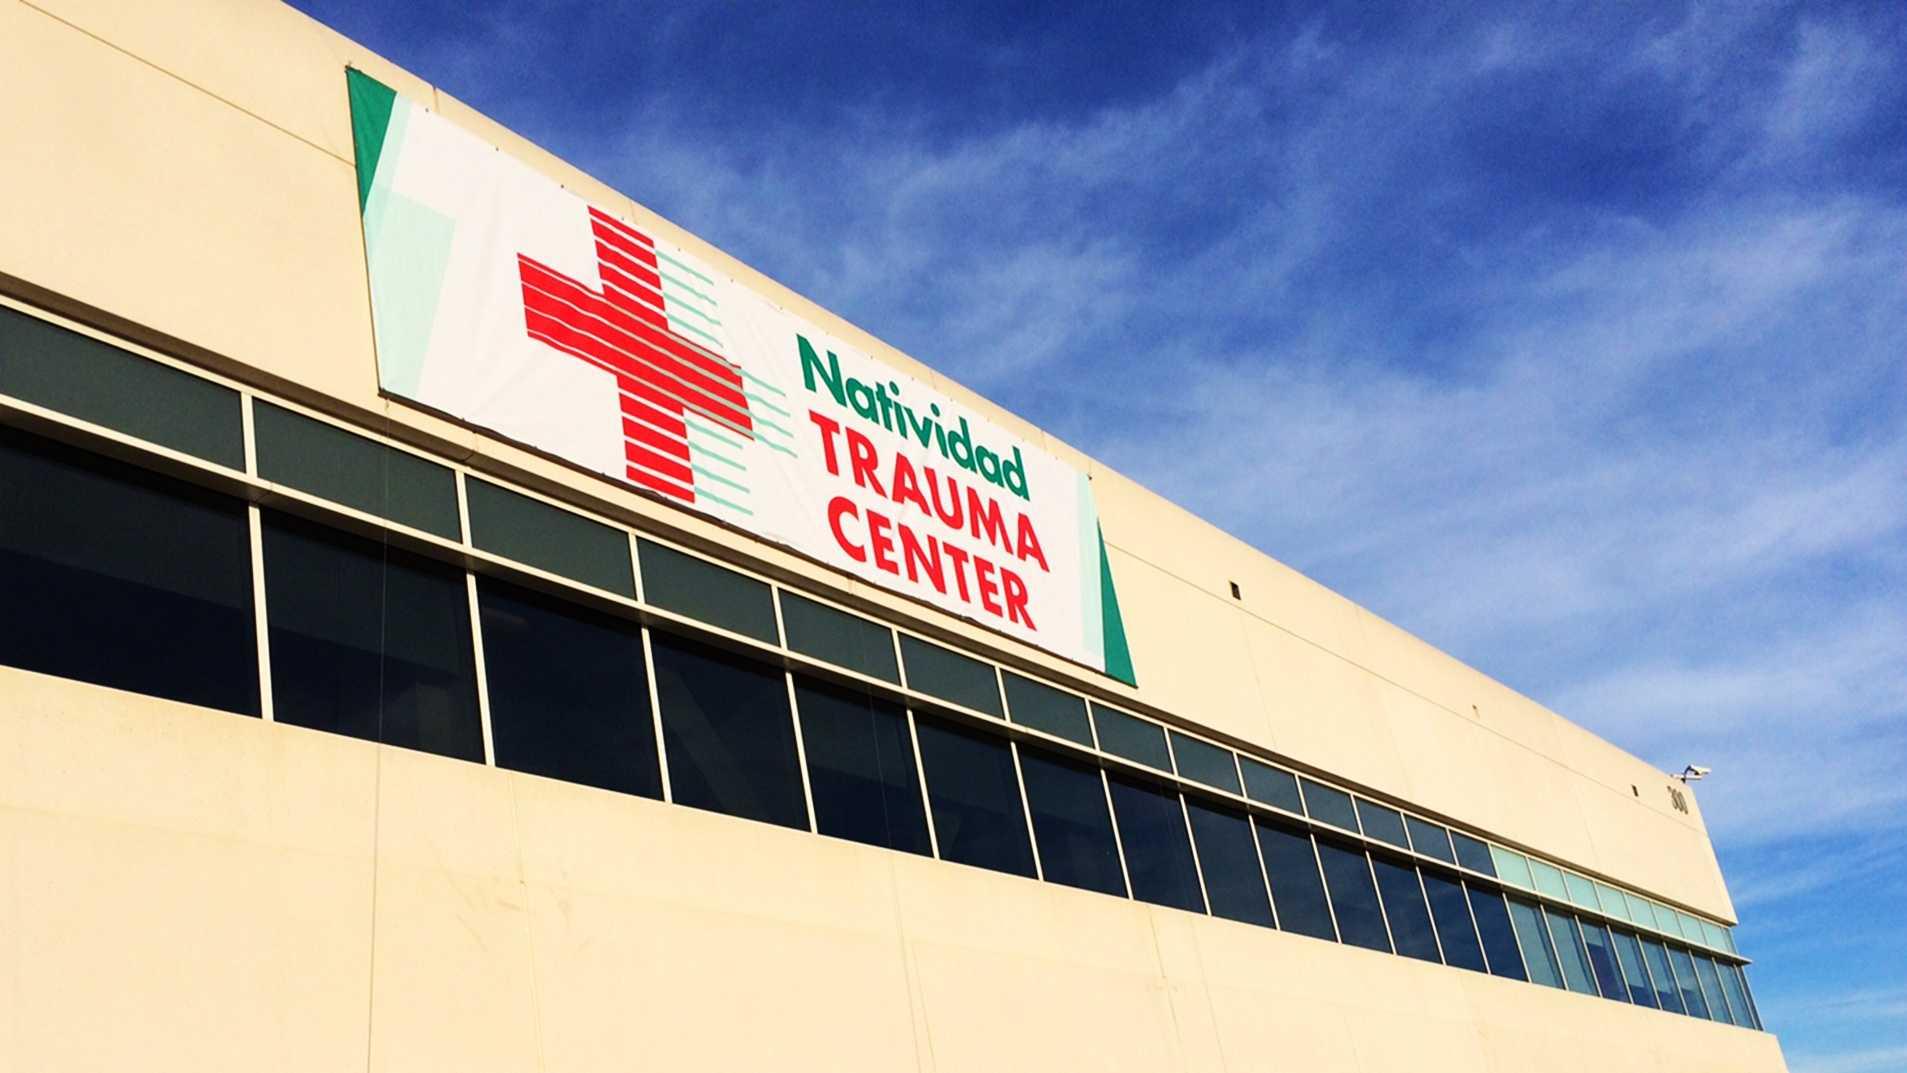 Natividad Medical Center in Salinas built the Central Coast's first ever trauma center.